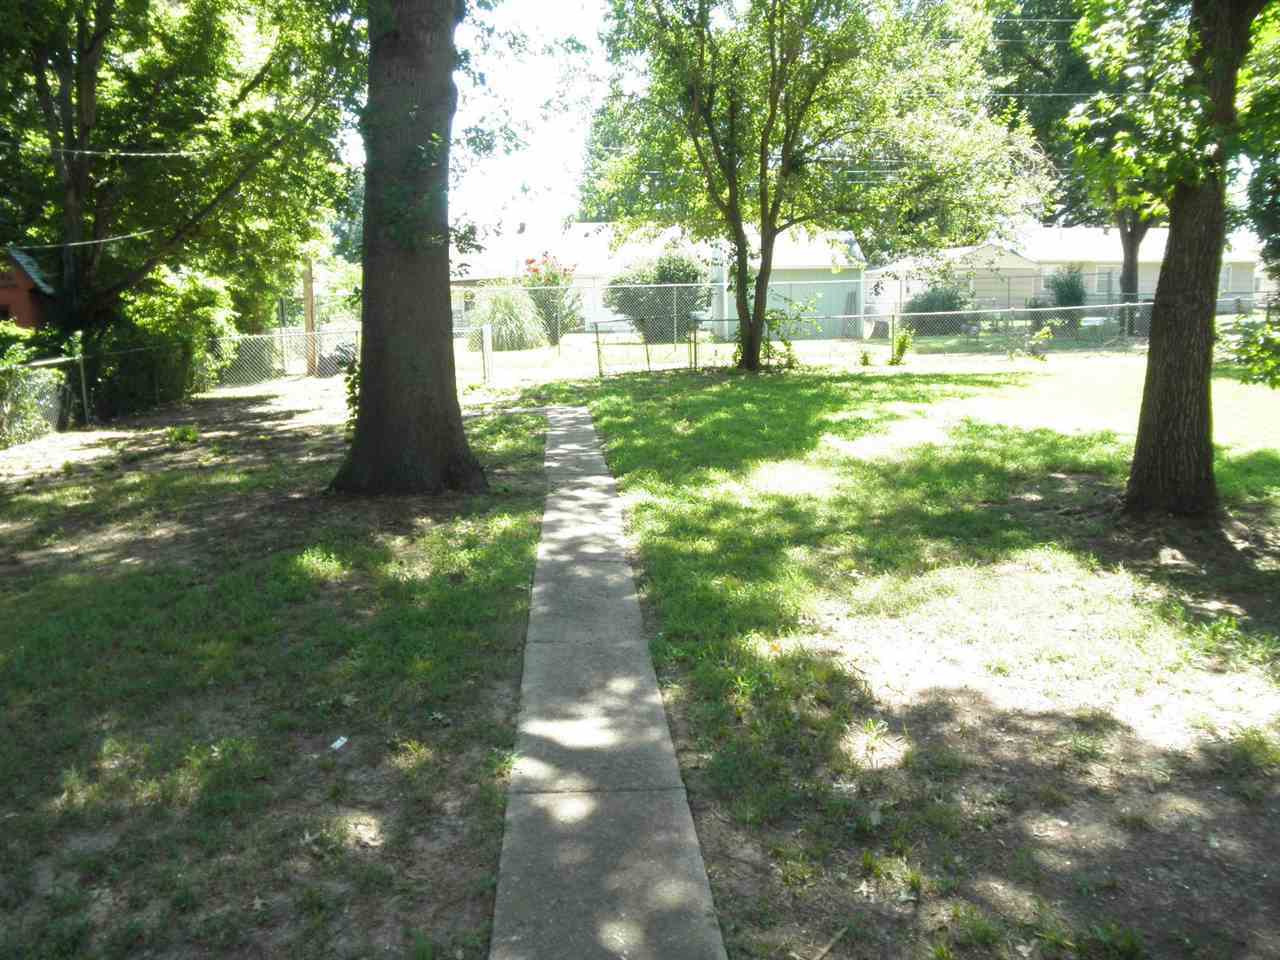 #century21groupone, #homesforsaleponcacity, #poncacityrealestate | 401 N 12th Ponca City, OK 74601 15